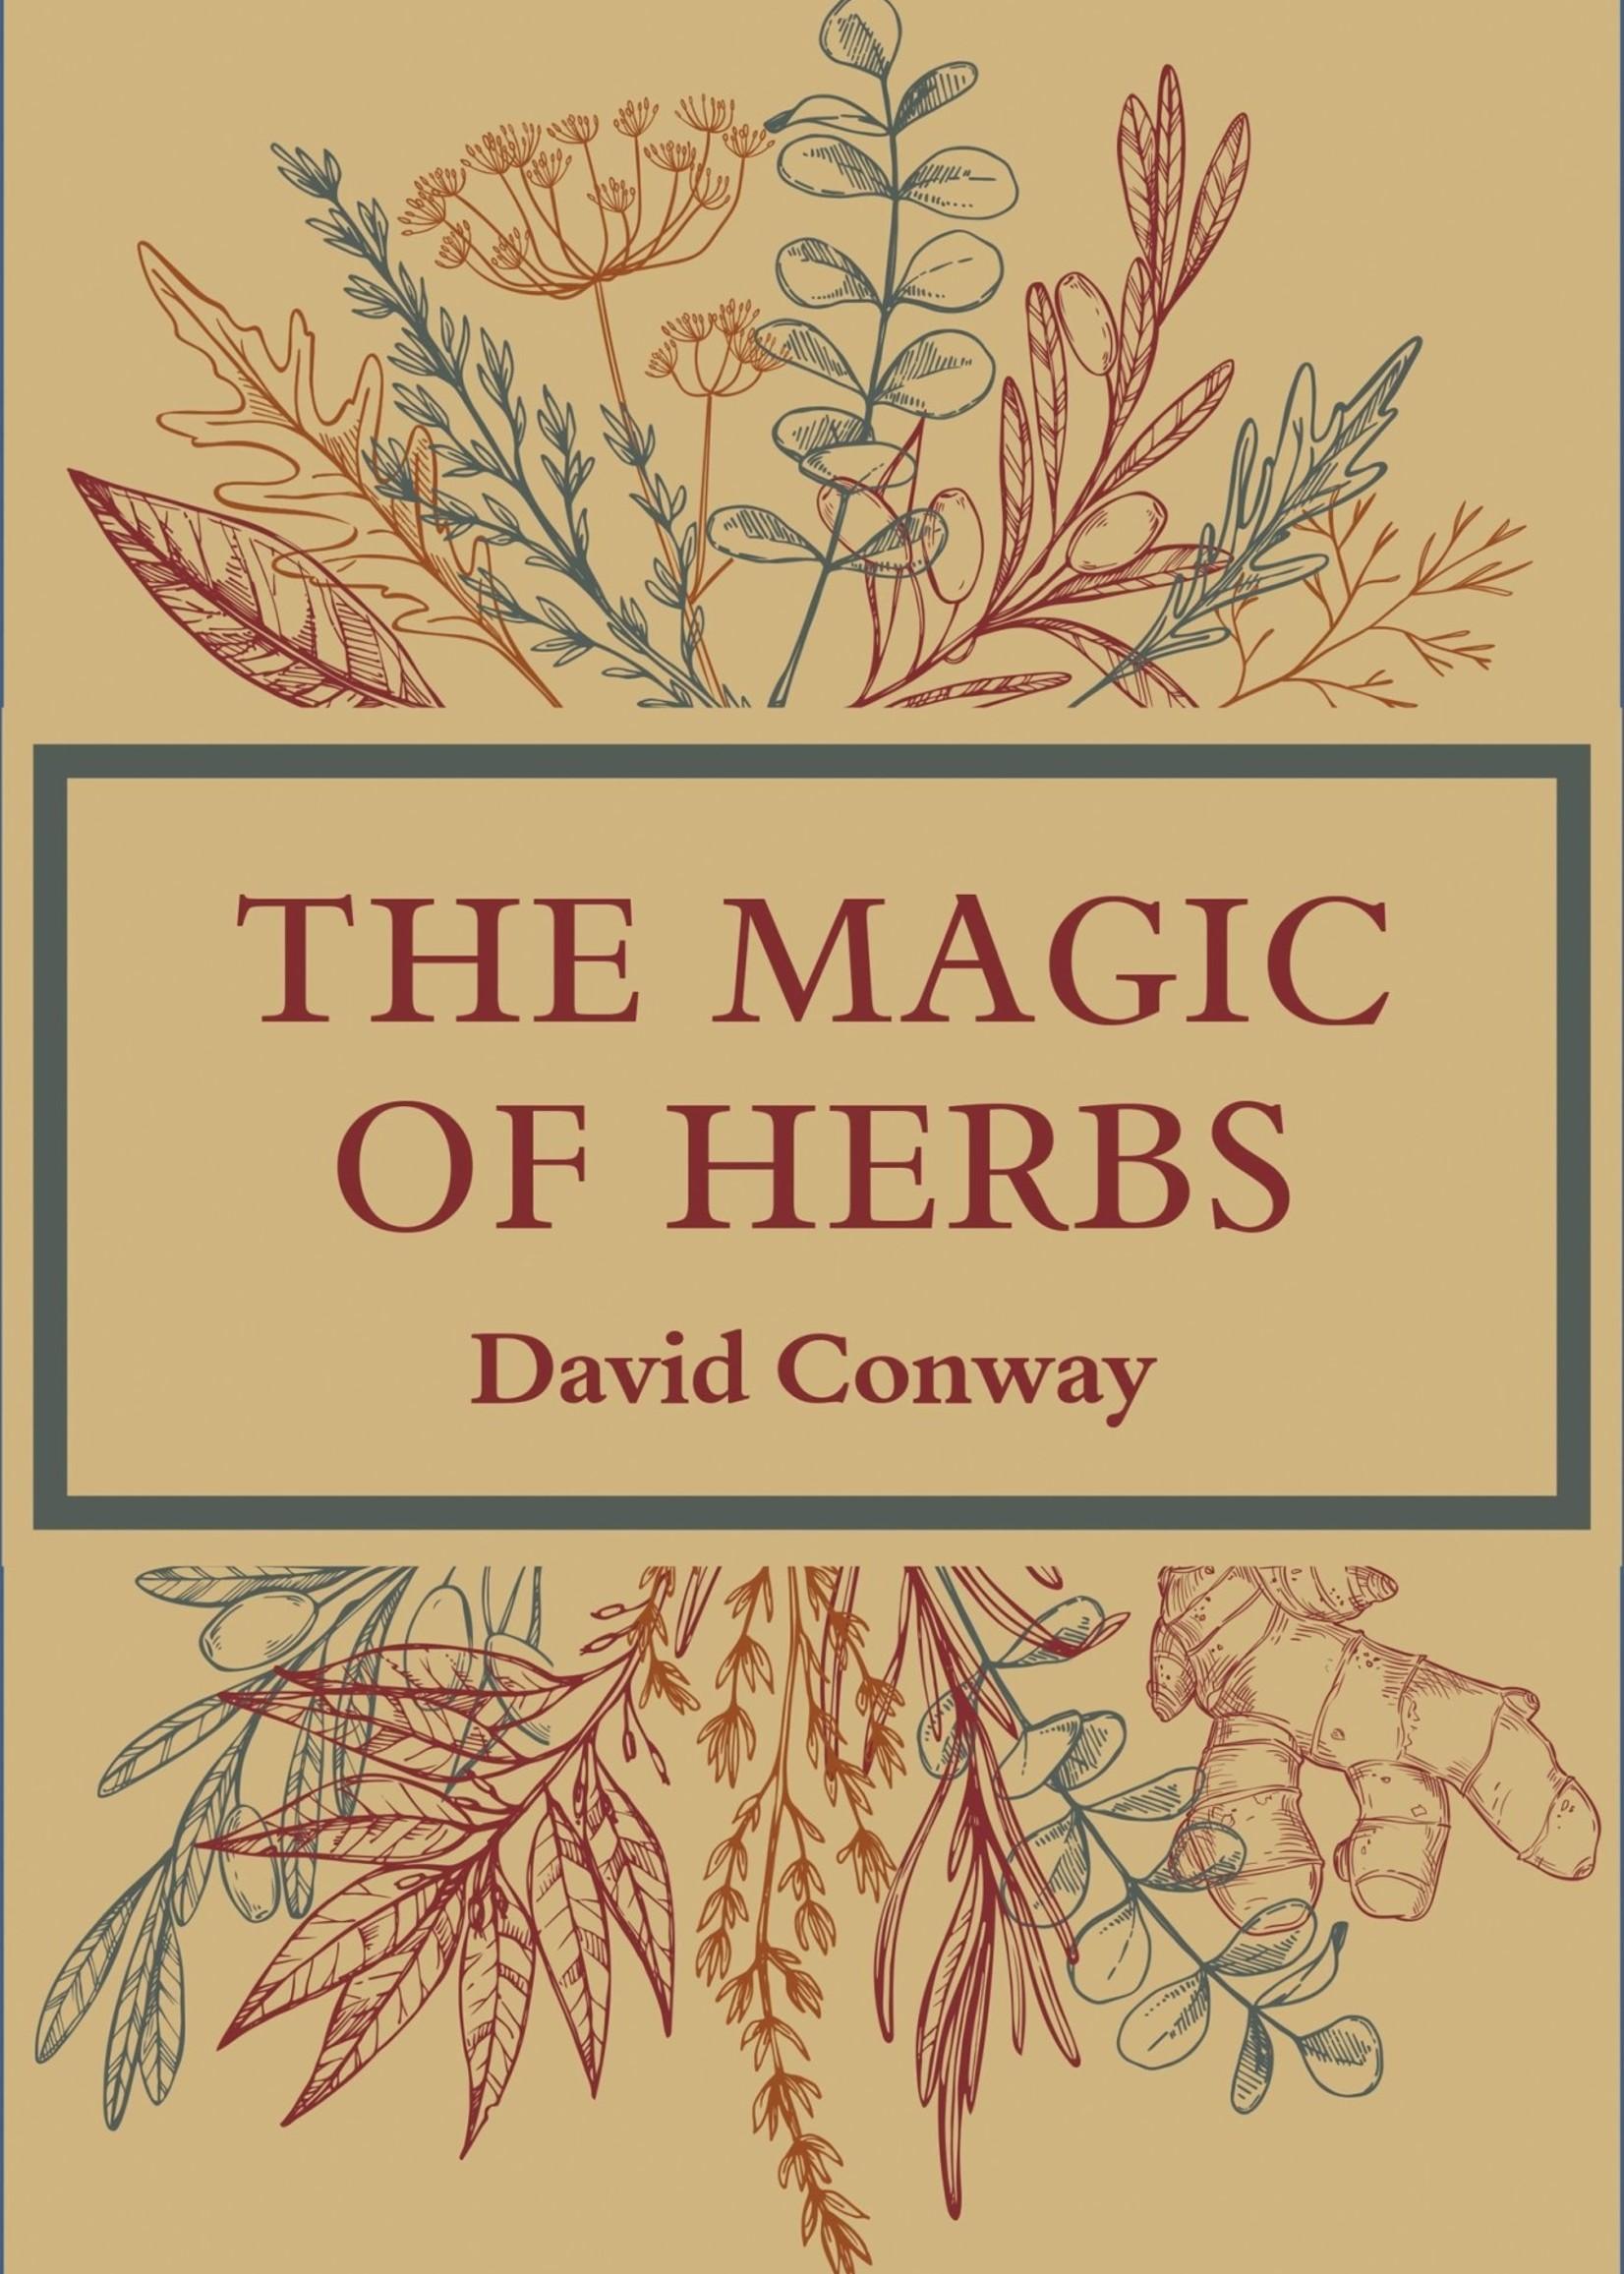 The Magic of Herbs (David Conway)